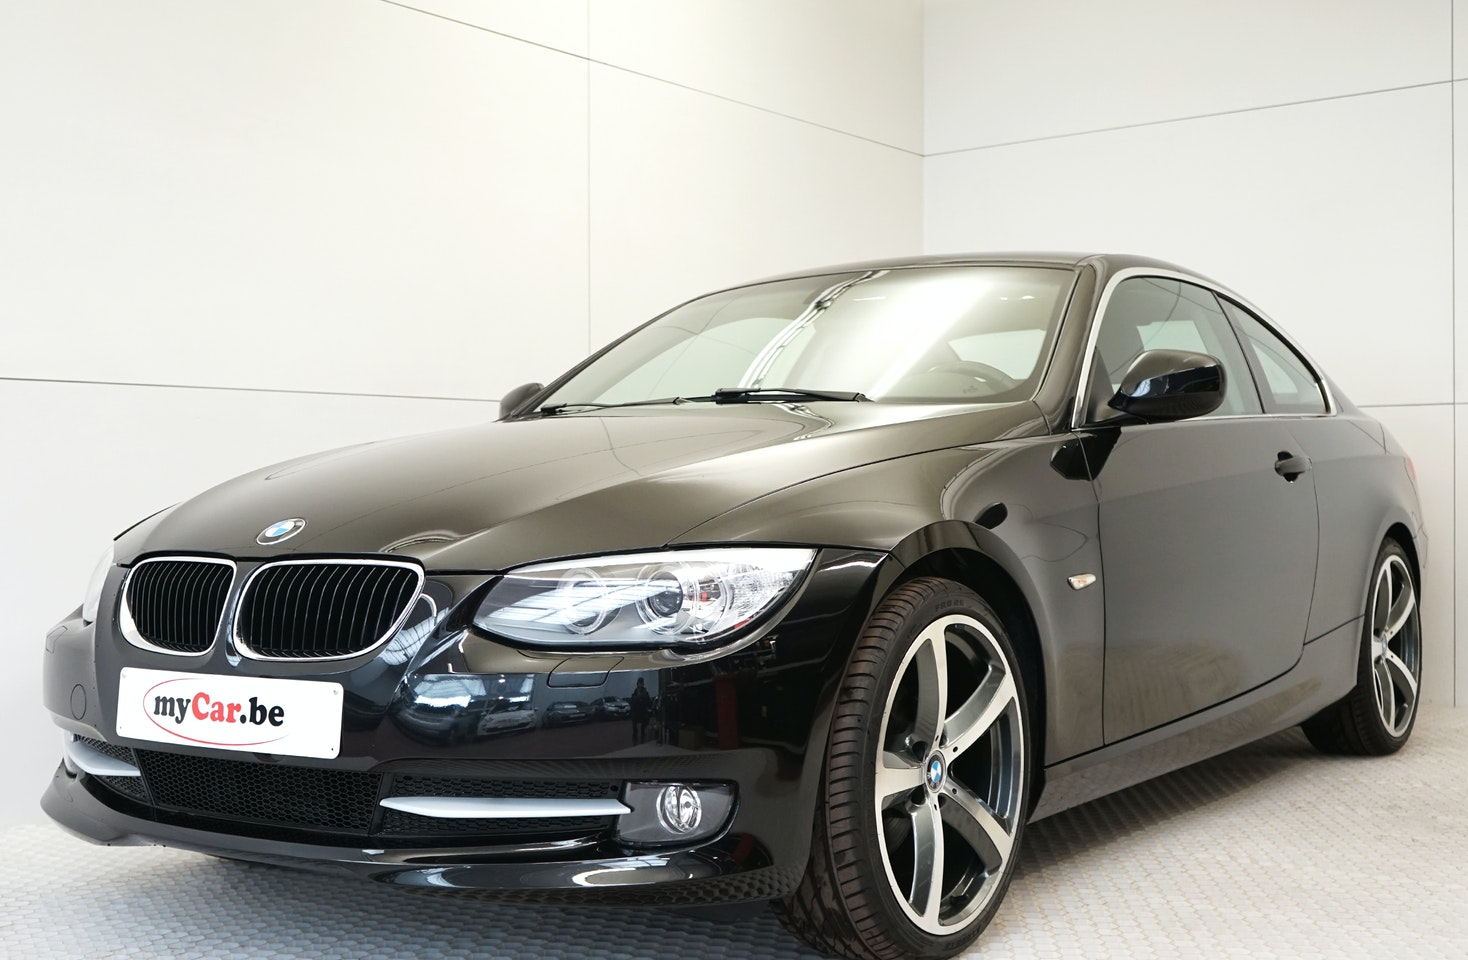 Verwonderlijk BMW 3 320d - Coupé • myCar.be is the specialist in (almost-) new cars! XH-36